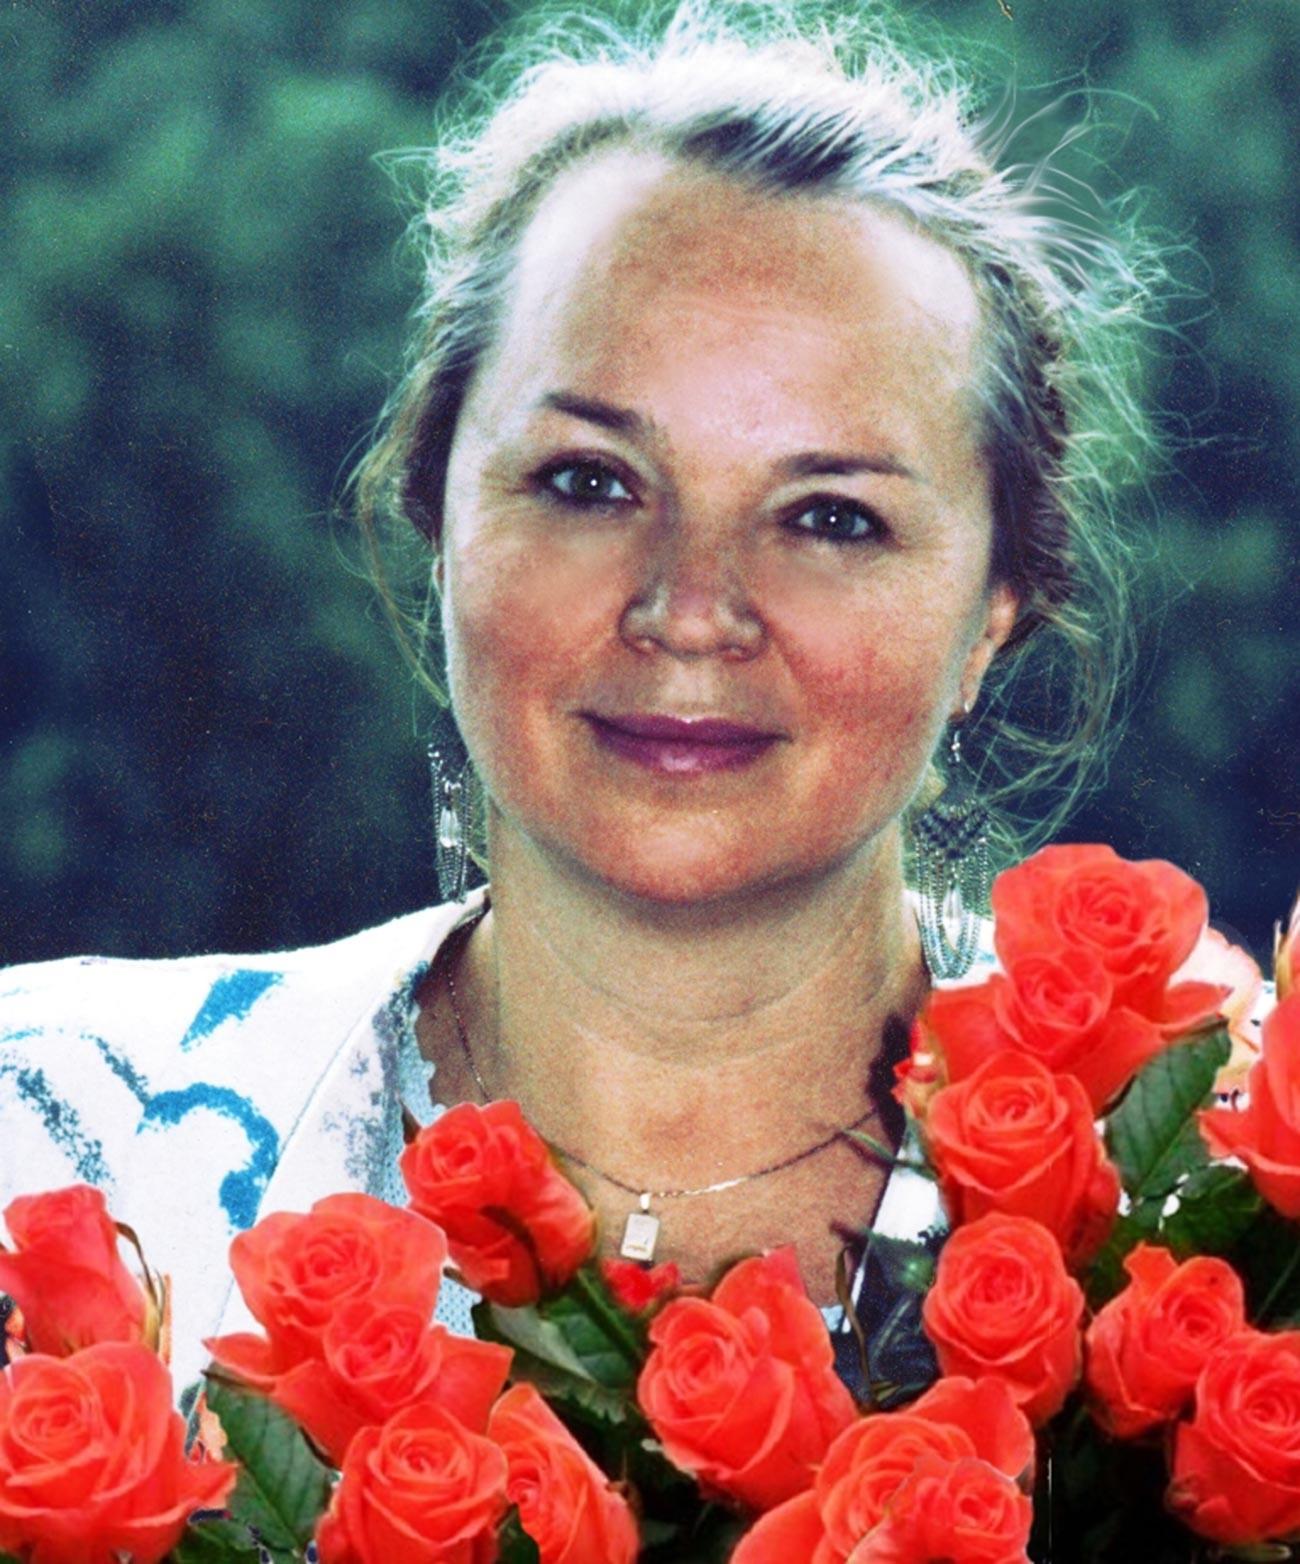 Valentina Kuznetsova was not the type who gave up easily.